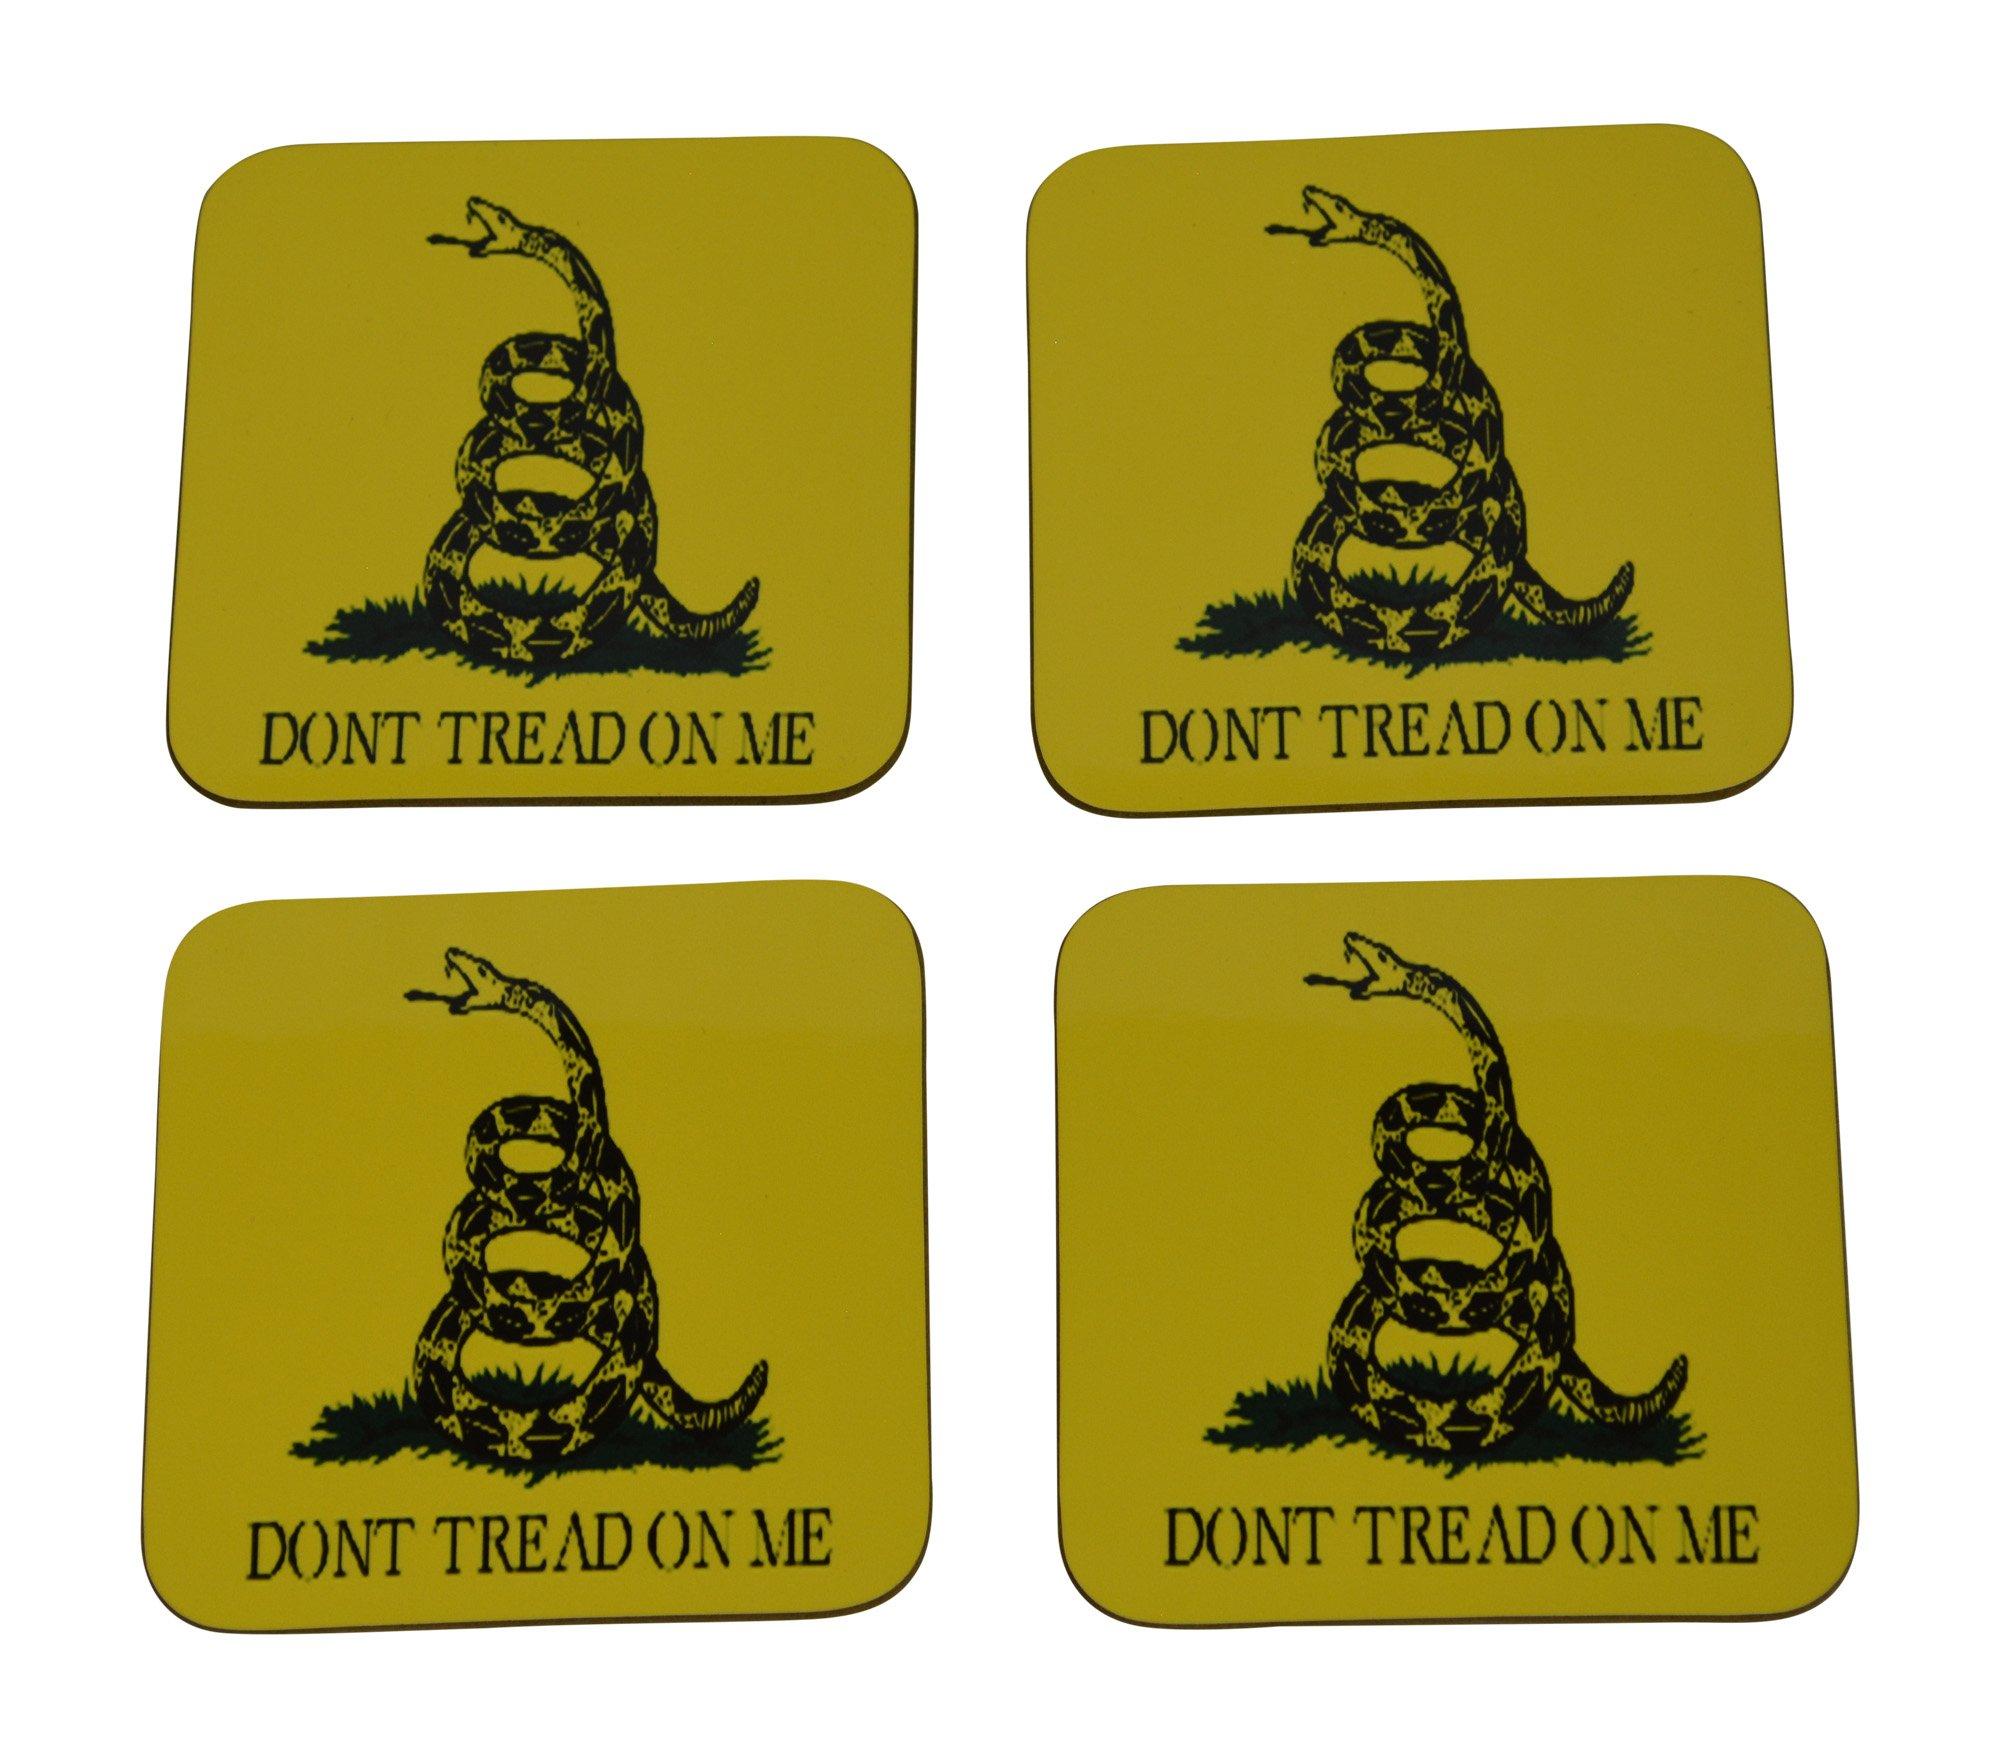 Don't Tread On Me Partiotic Flag Drink Coaster Set Gift Gadsden United States of America Military Veteran Home Kitchen Bar Barware